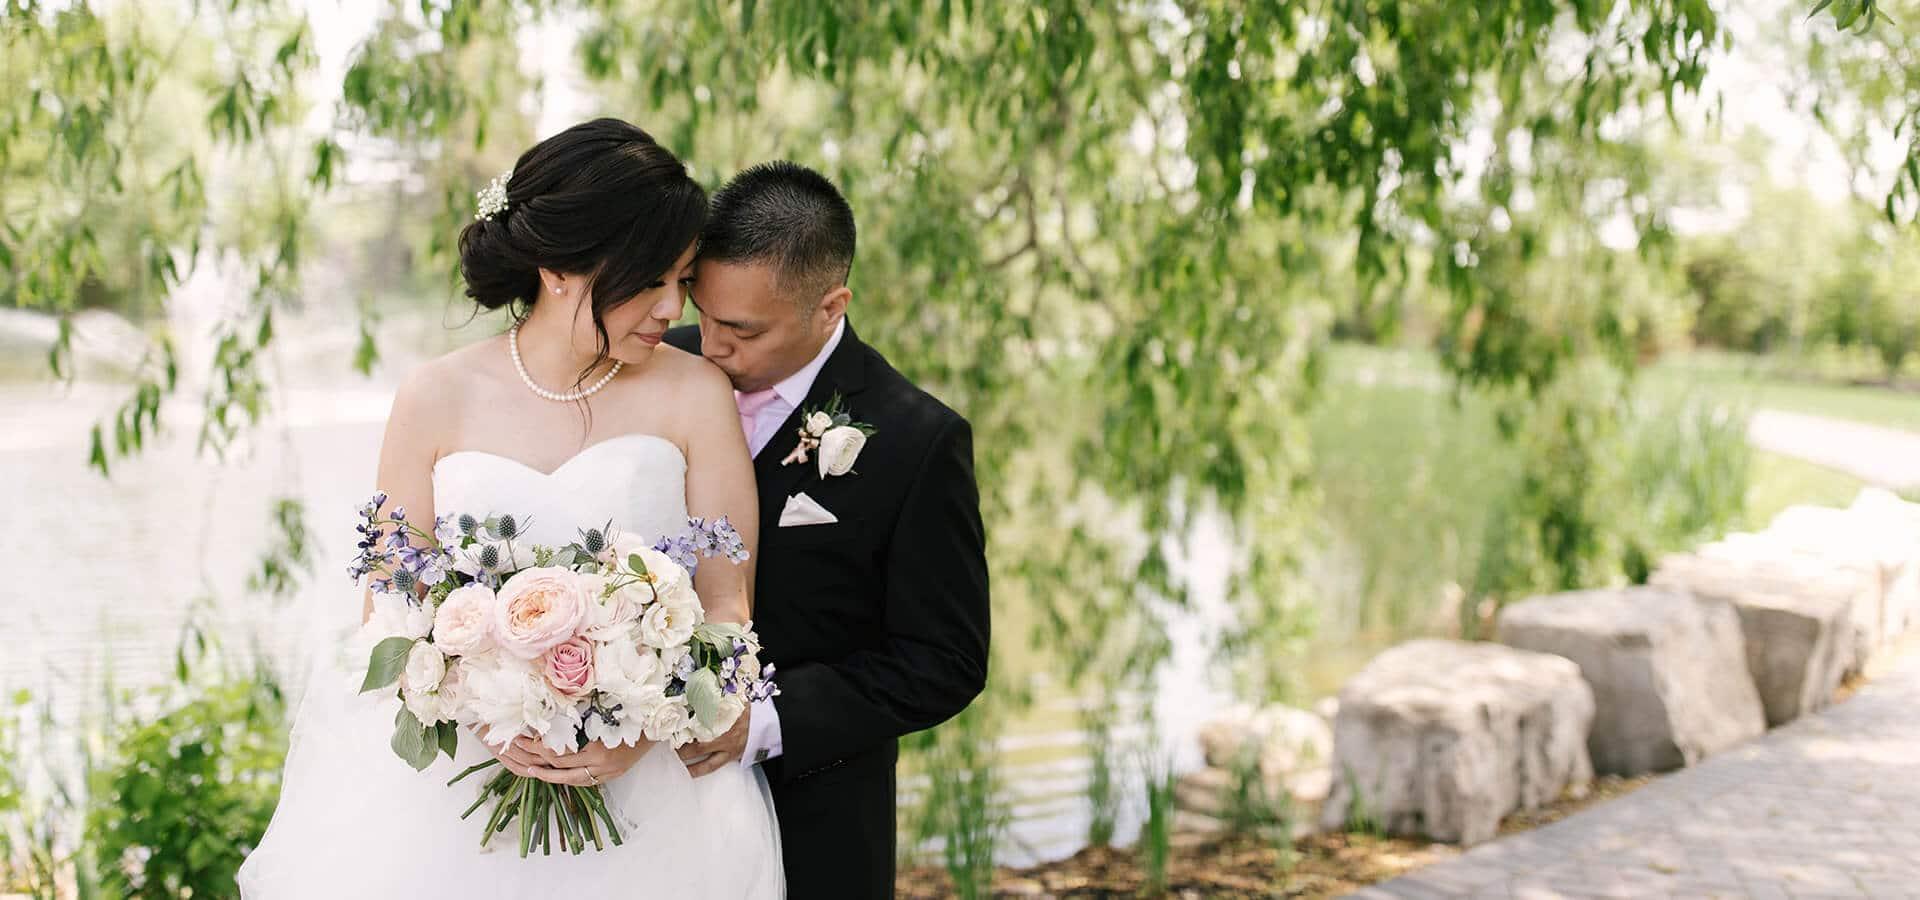 Hero image for Yar Ting and Carlson's Beautiful Arlington Estate Wedding